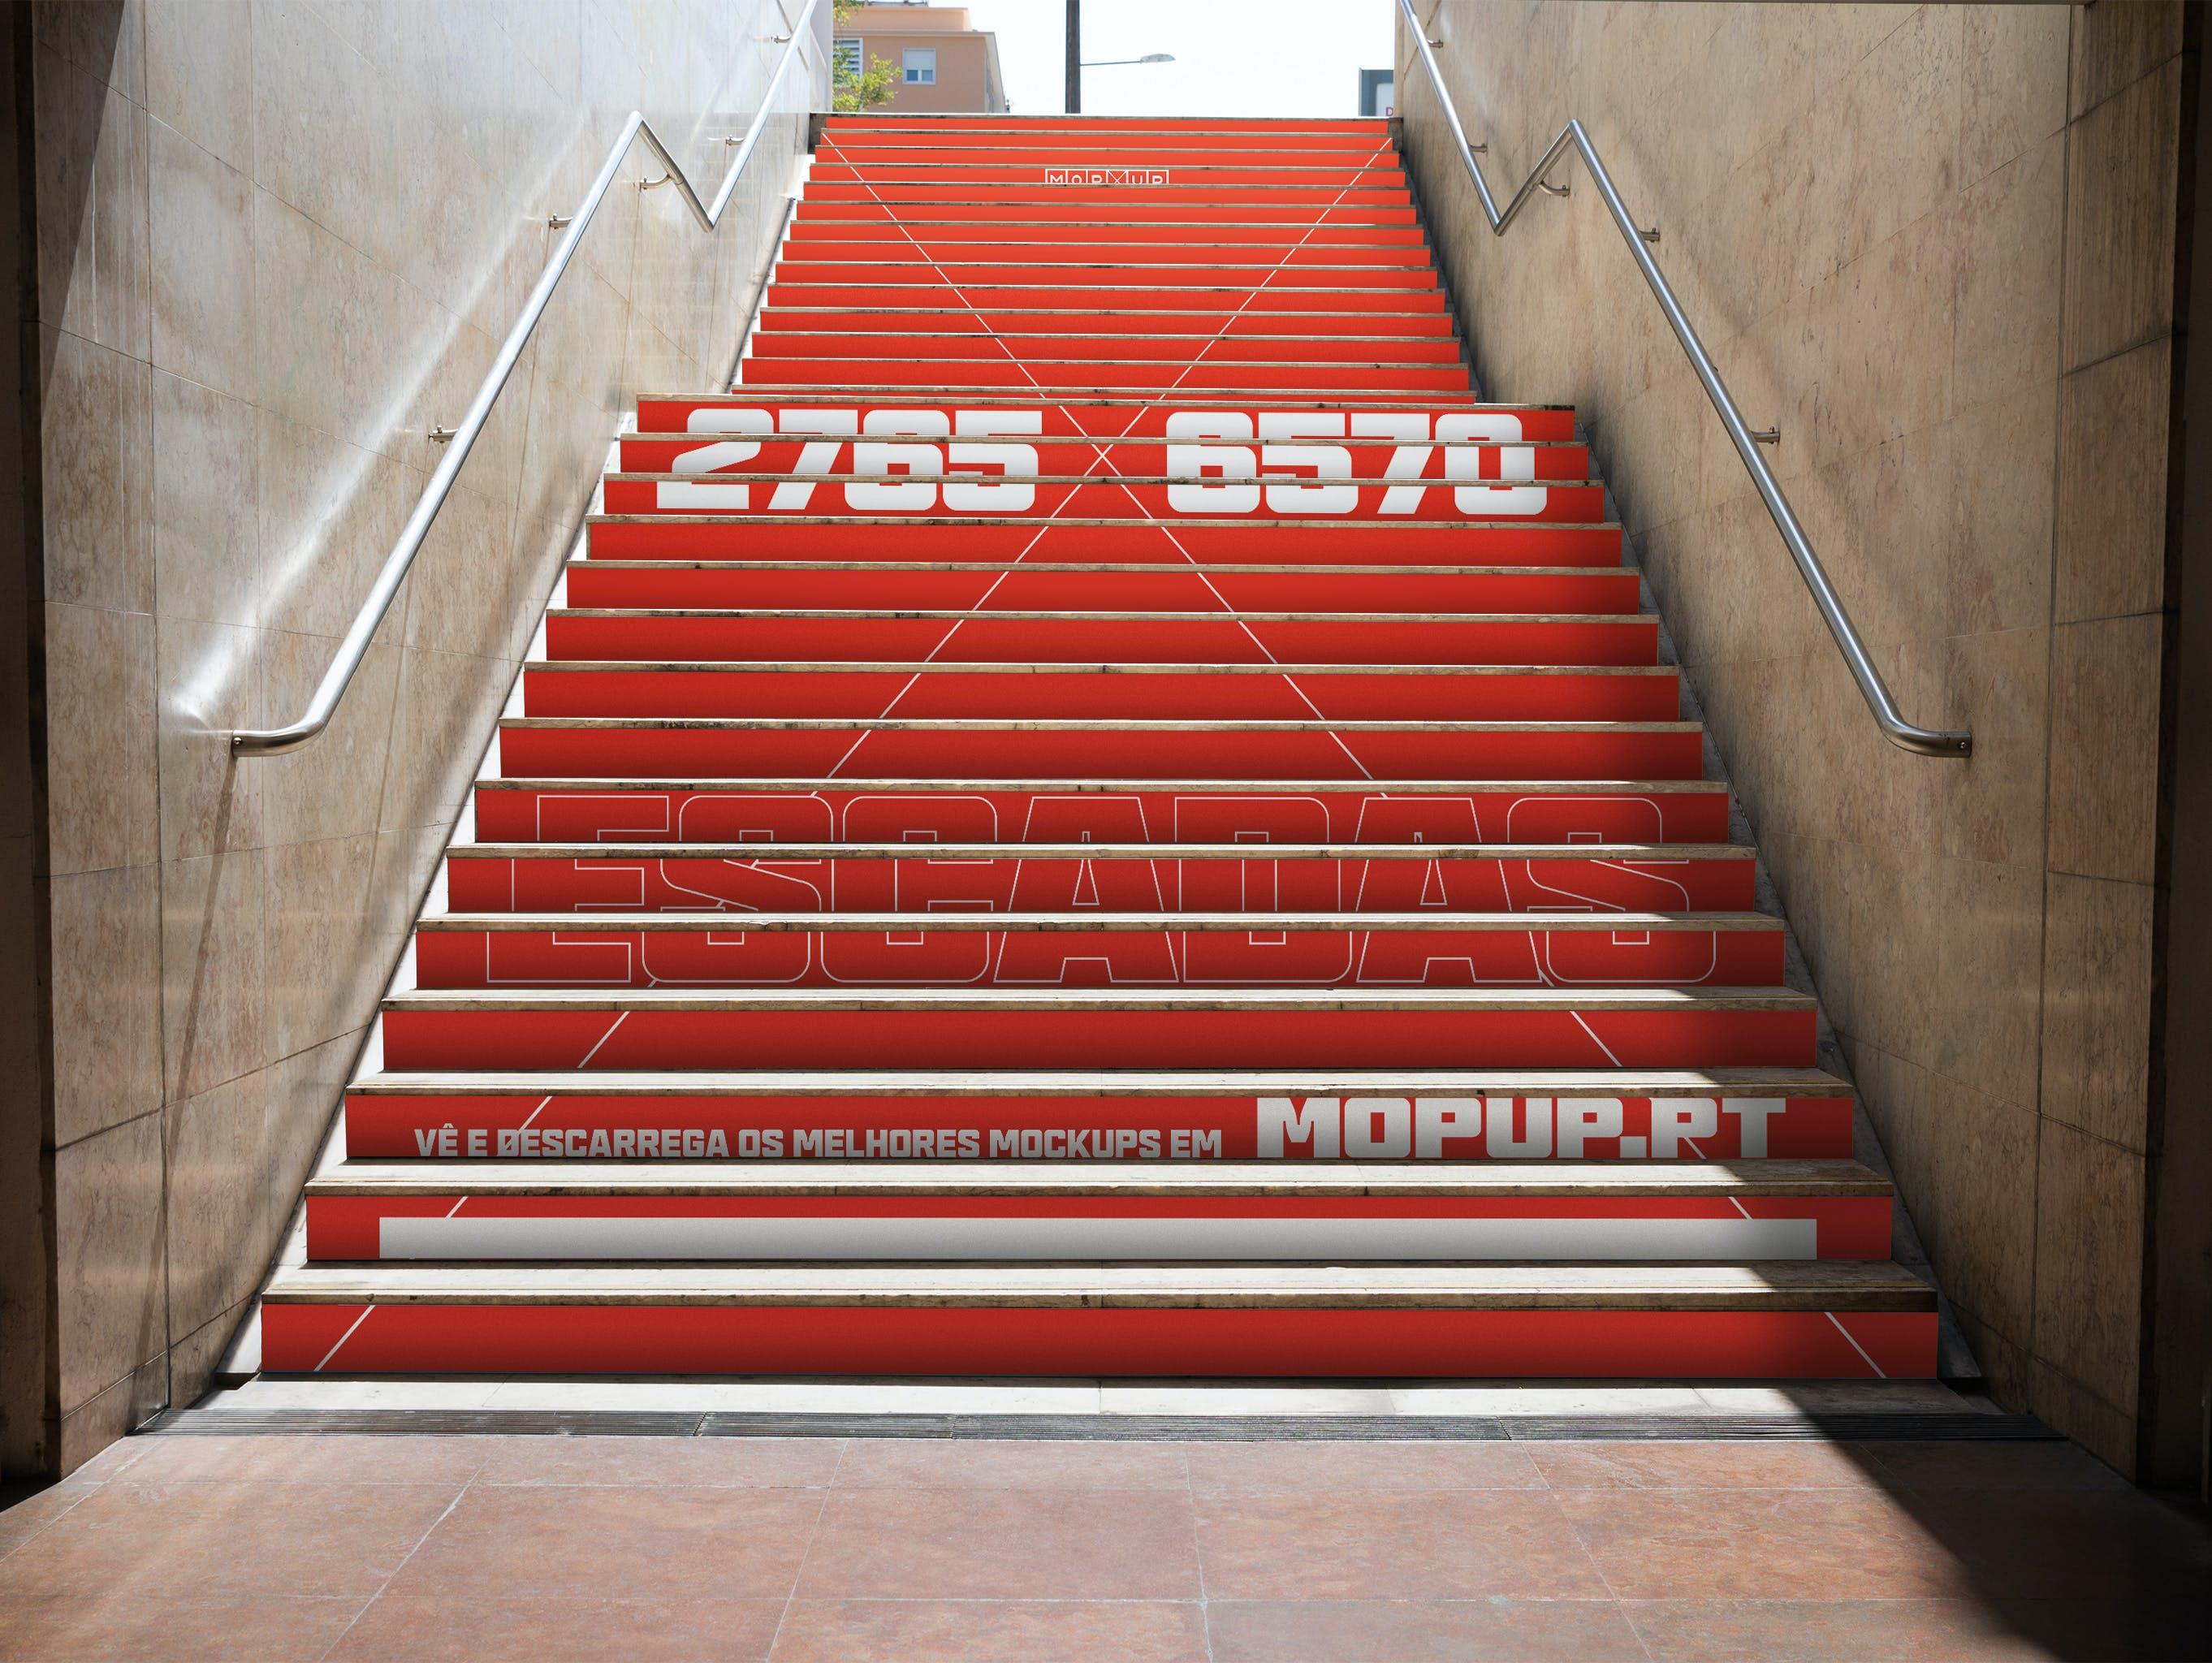 MOPUP - Escadas do Metro de Alvalade - Mockup